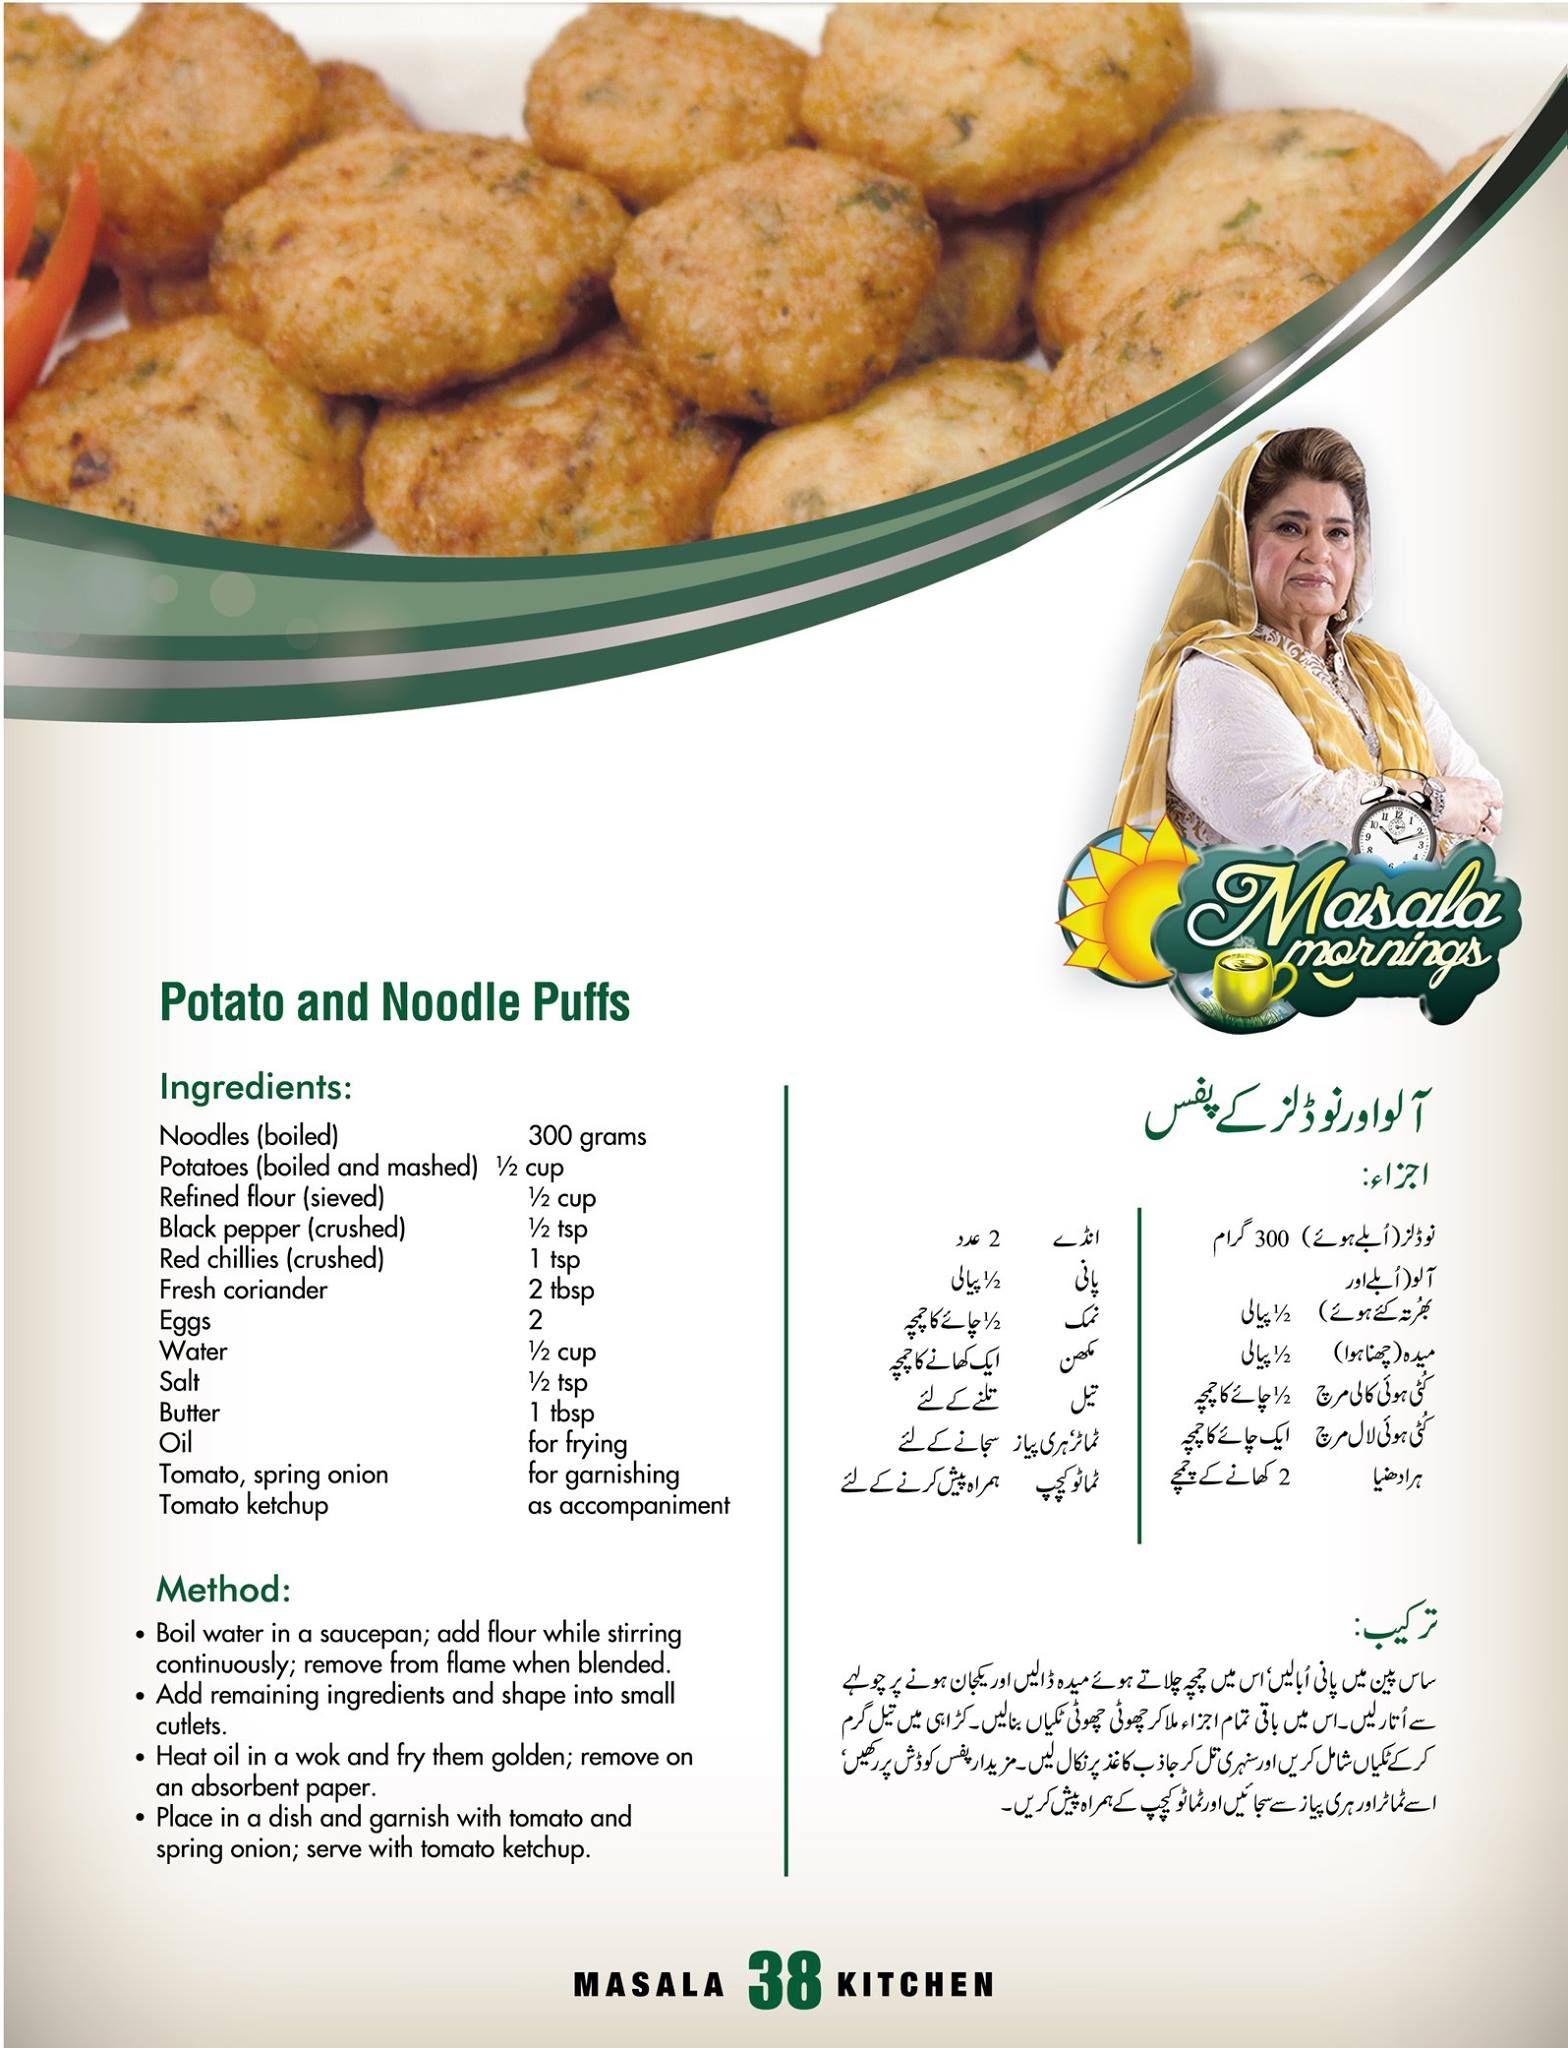 Pin by Kashif Naeem on Recipe | Pinterest | Recipes